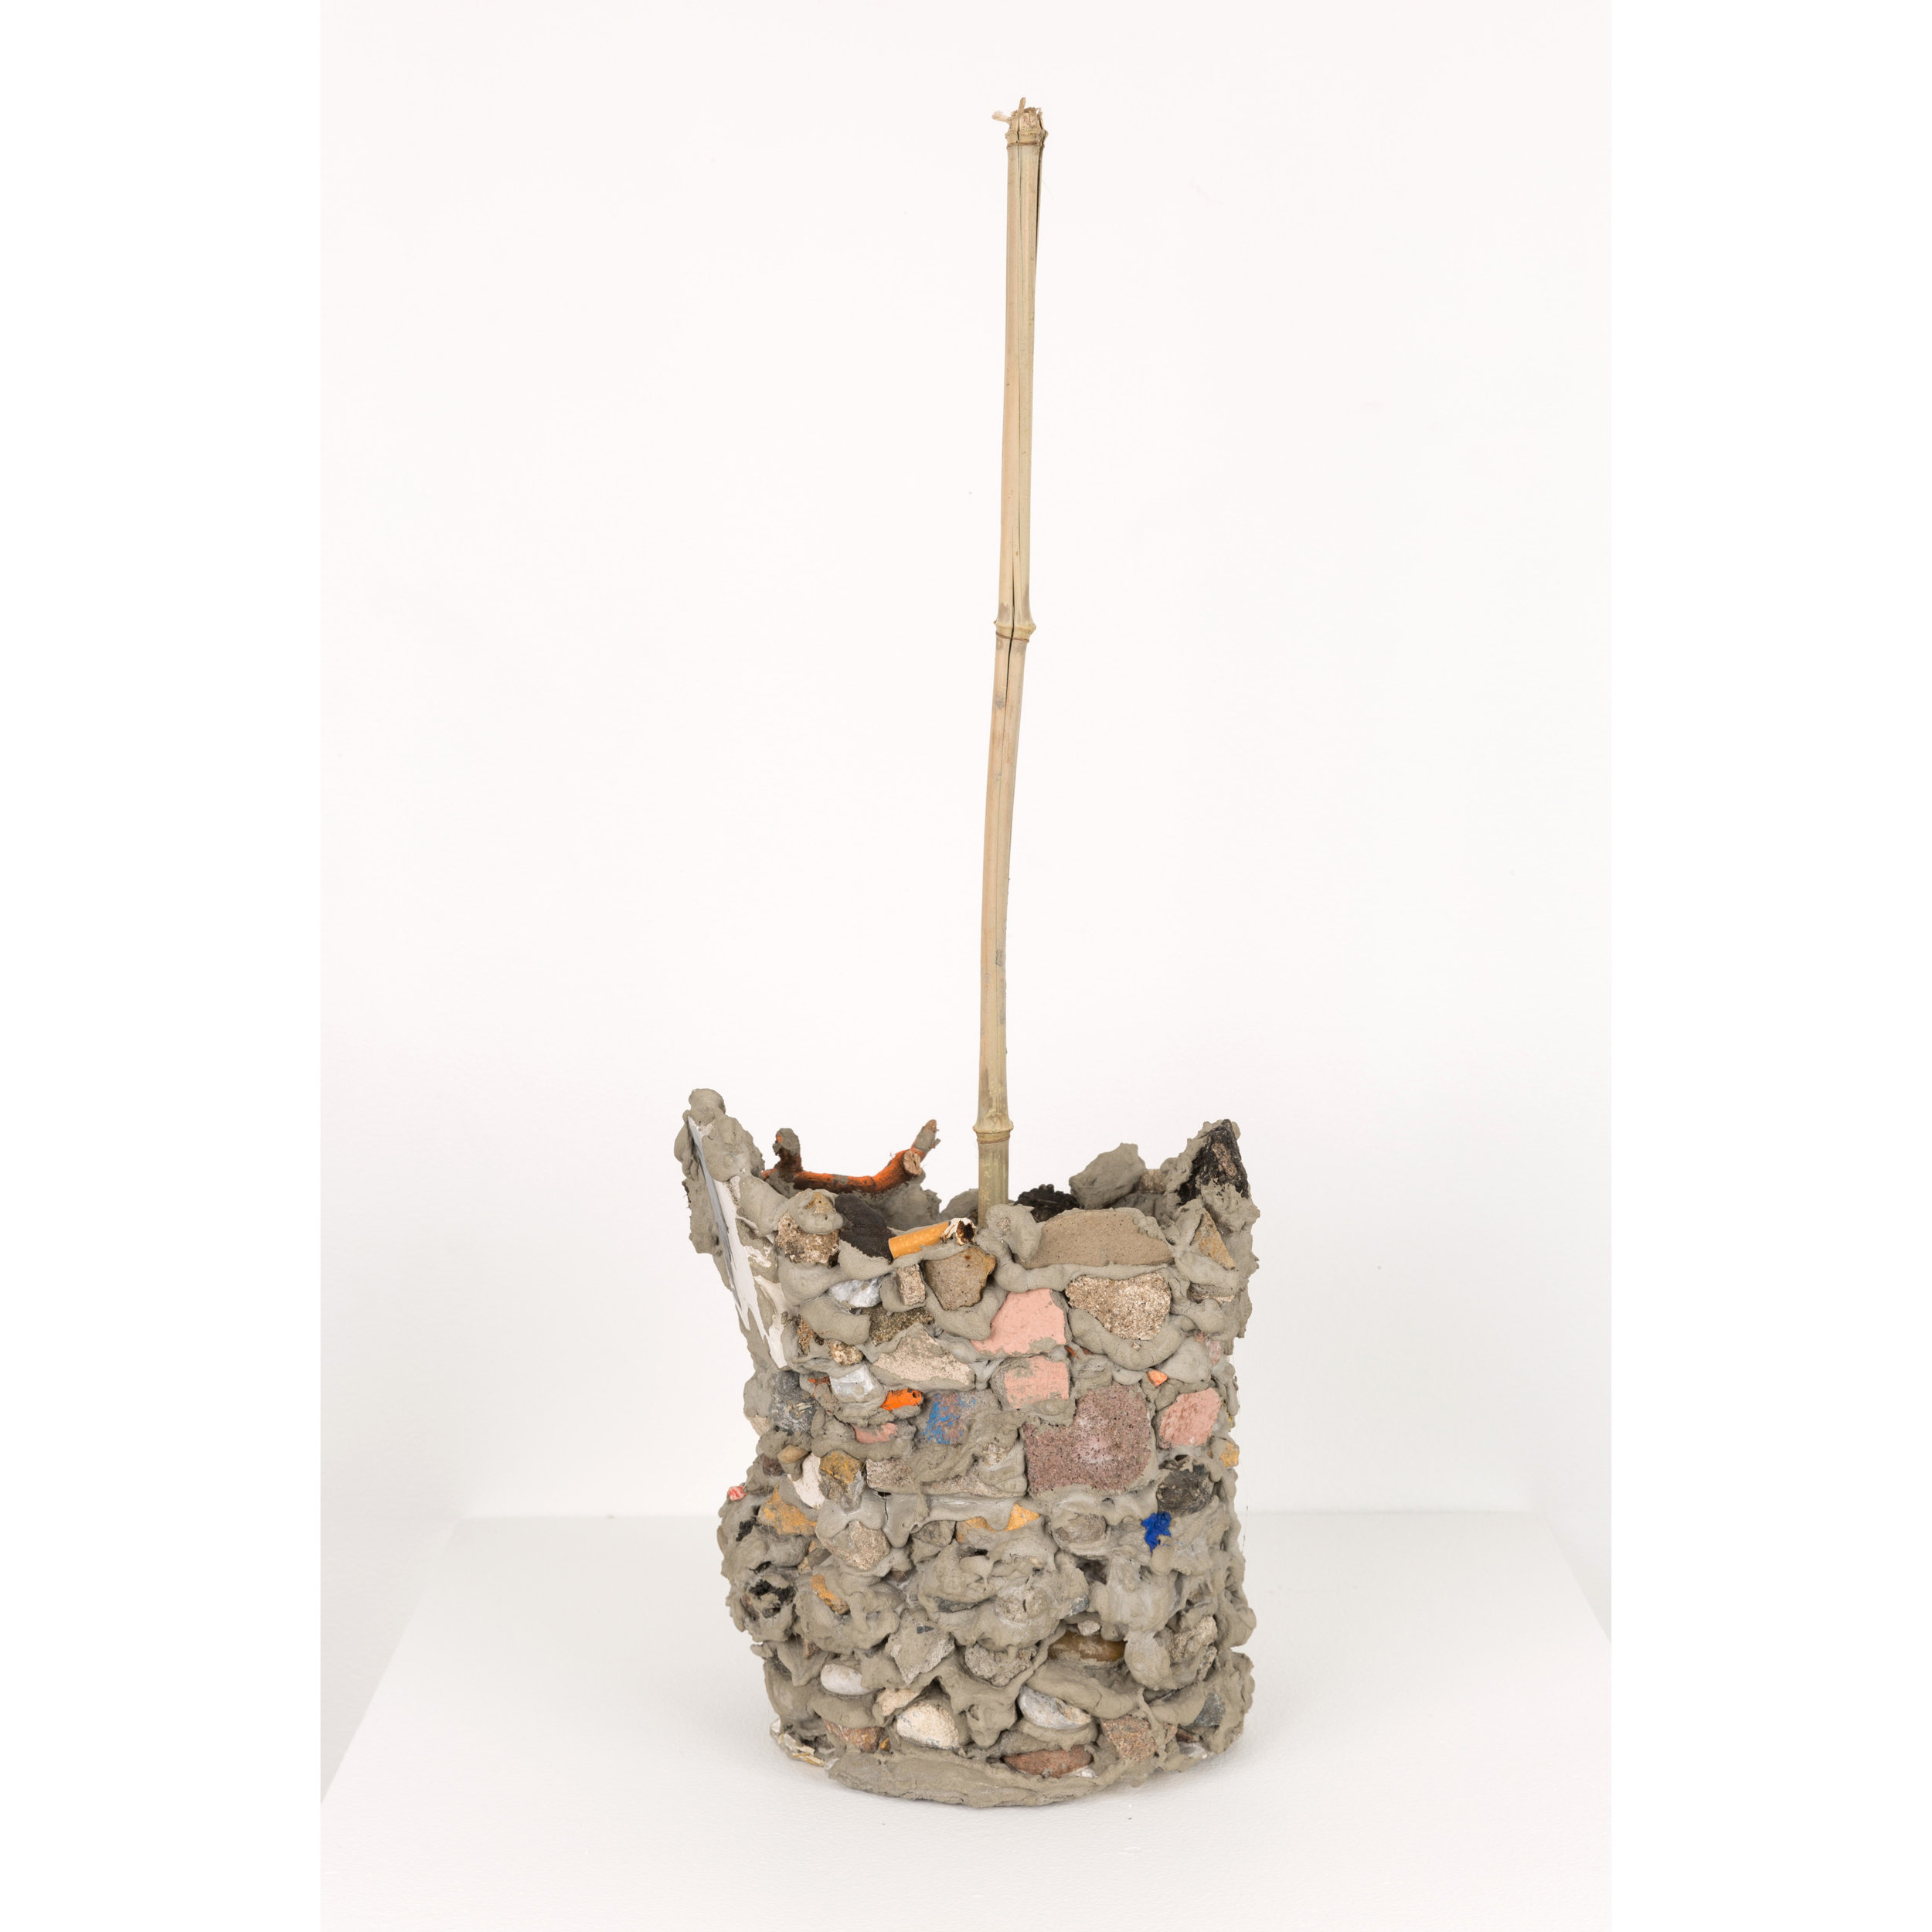 Vessel , 2017 concrete, stones, stick, cigarette butt, shells, bamboo, spray paint 25 x 9 x 7 in